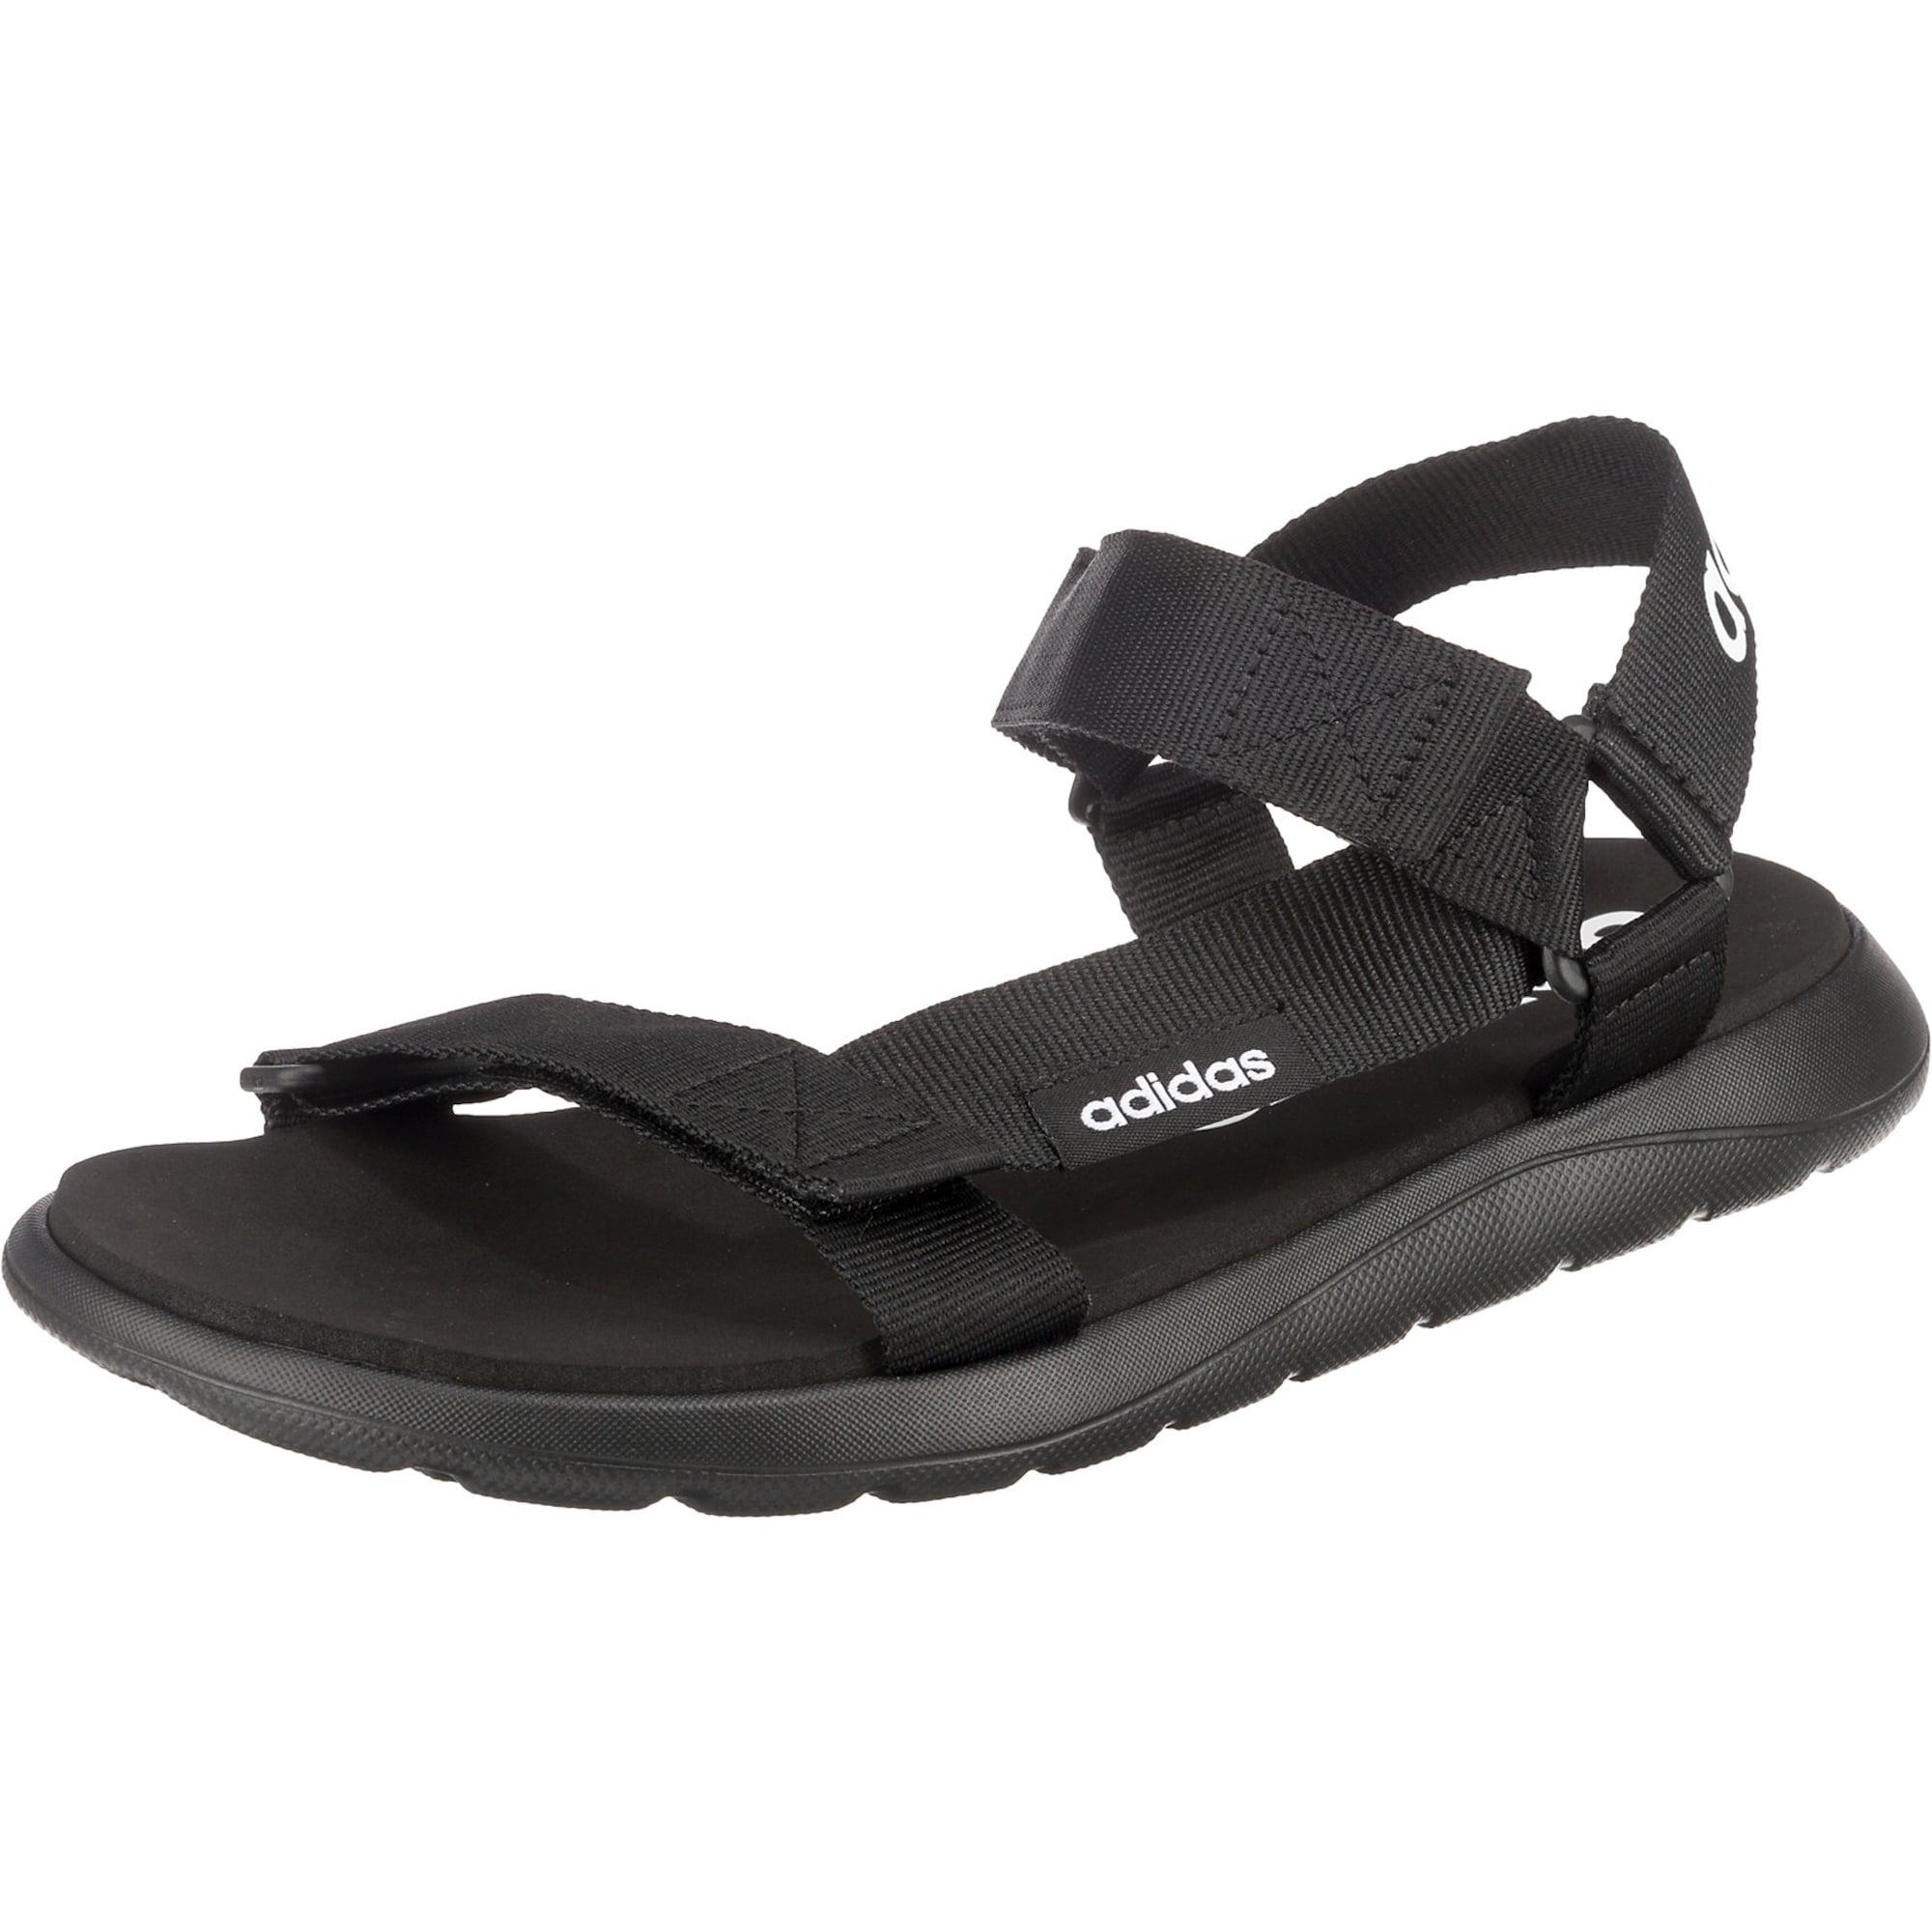 ADIDAS PERFORMANCE Sandalai juoda / balta